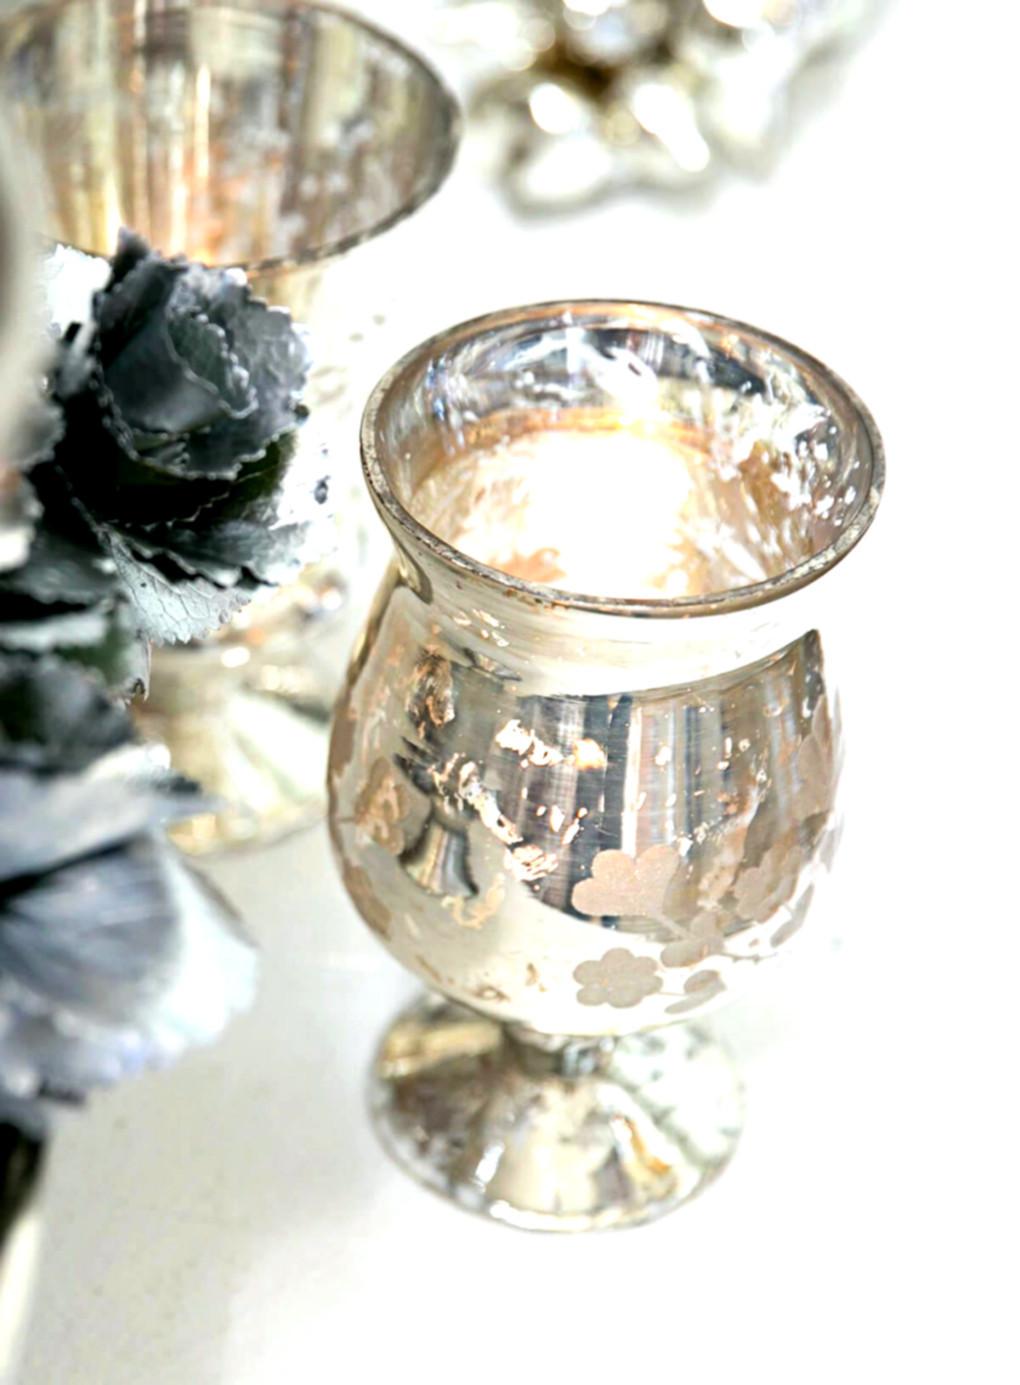 fluted glass bud vase of glass vases large clear glass vases 26 7 8″ tall clear fluted inside large clear glass vases 26 7 8″ tall clear fluted pictures